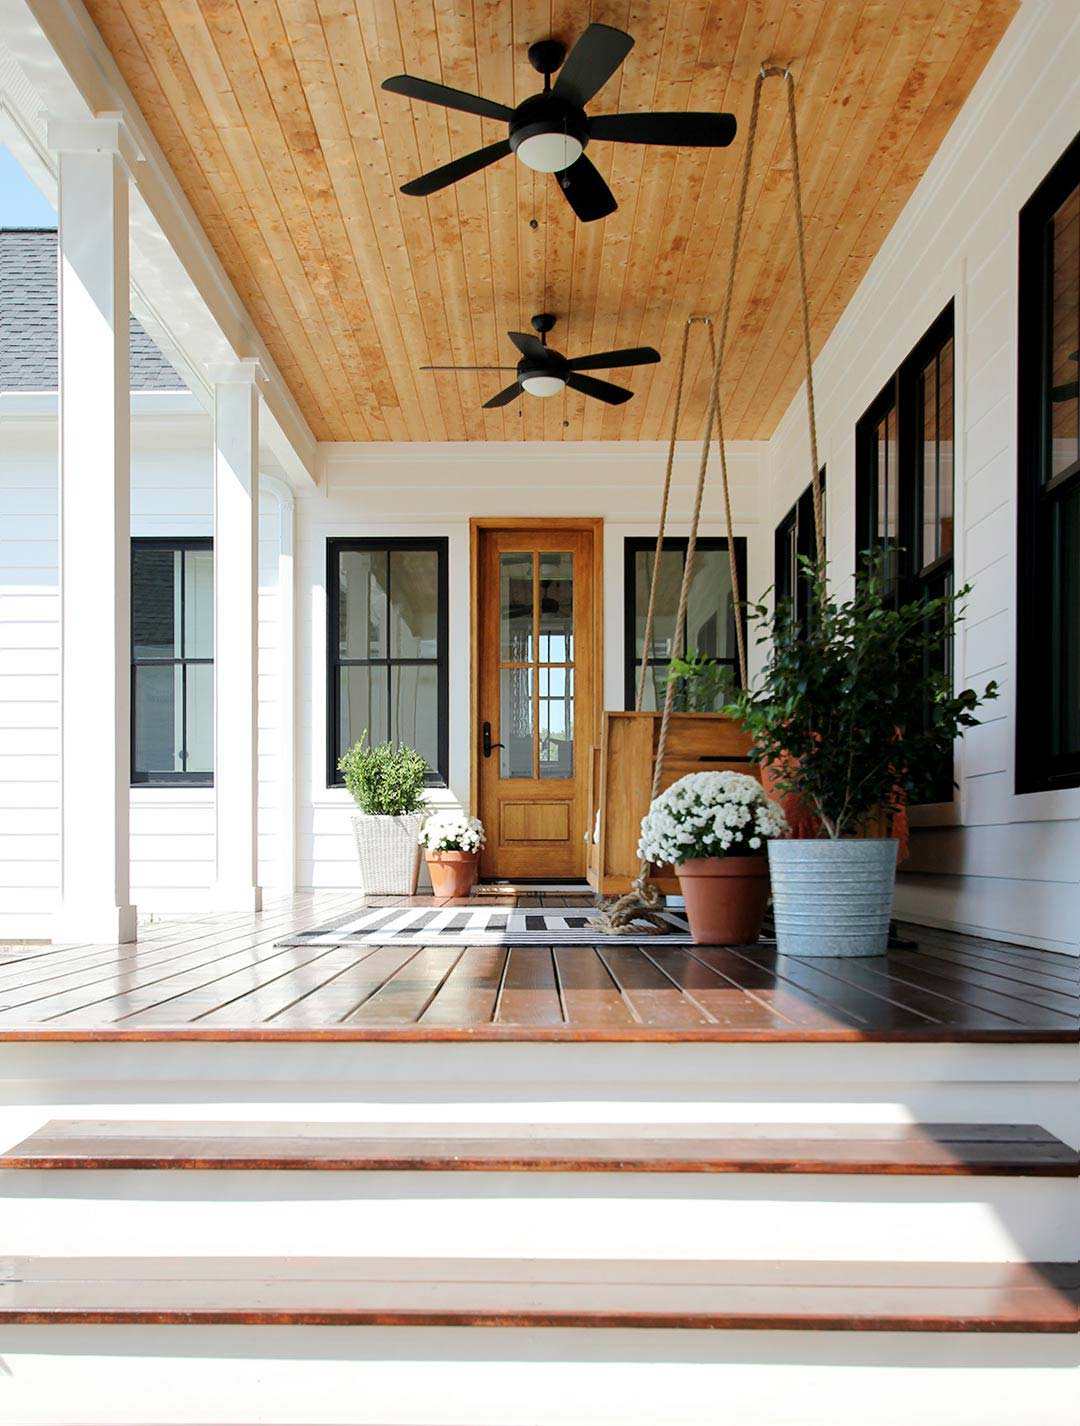 White Wicker Porch Swing